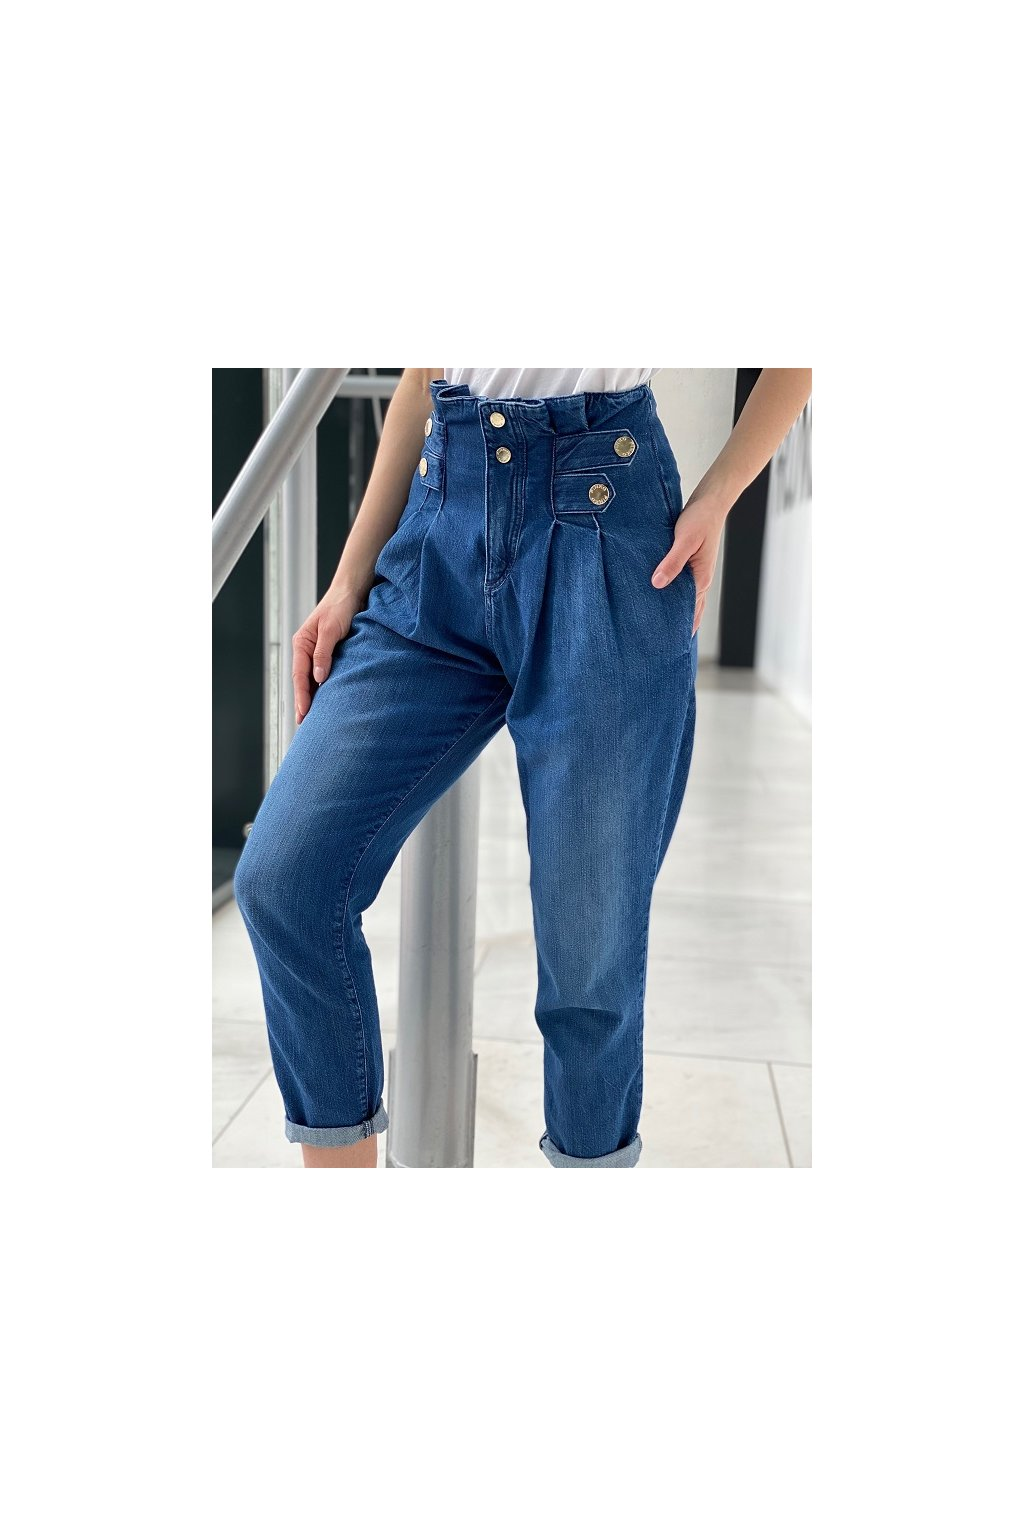 Dámské džíny Pinko New Cara Fashion Carrot PJ456 modré